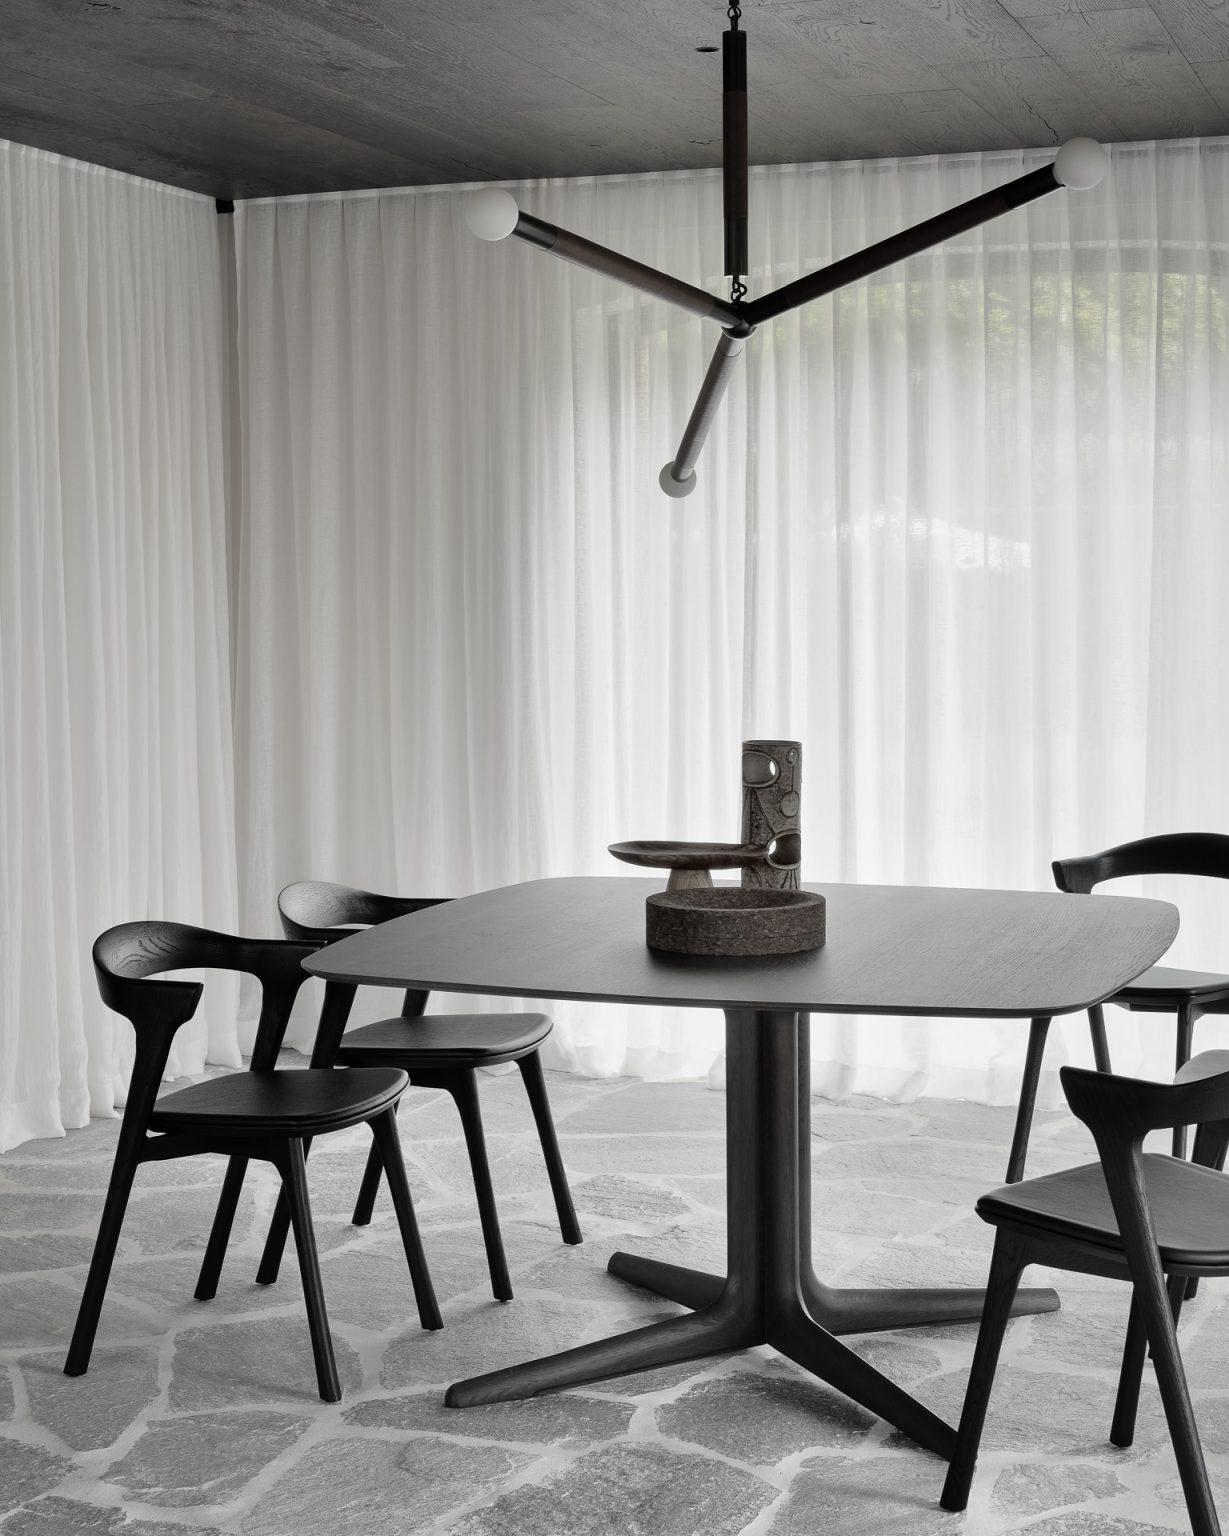 Biennale Interieur - Belgium's leading design and interior event - 50995_oak_brown_corto_dining_table_51492_oak_black_bok_chair_black_leather_3_web.jpg